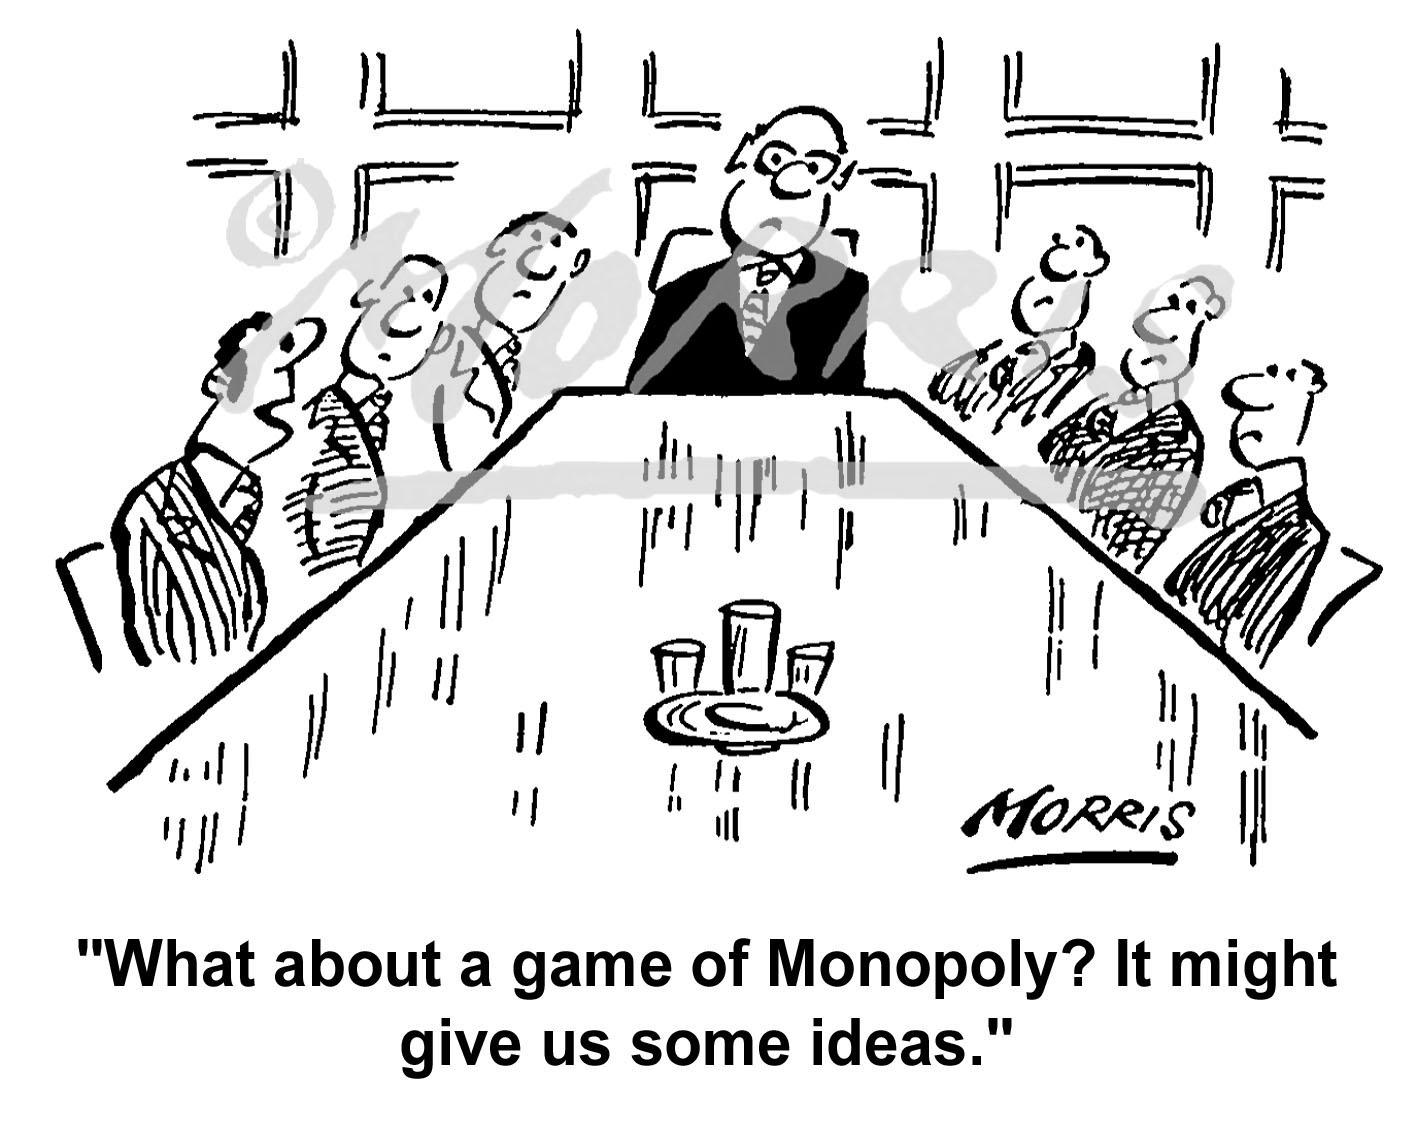 Boardroom meeting business cartoon Ref: 1391bw